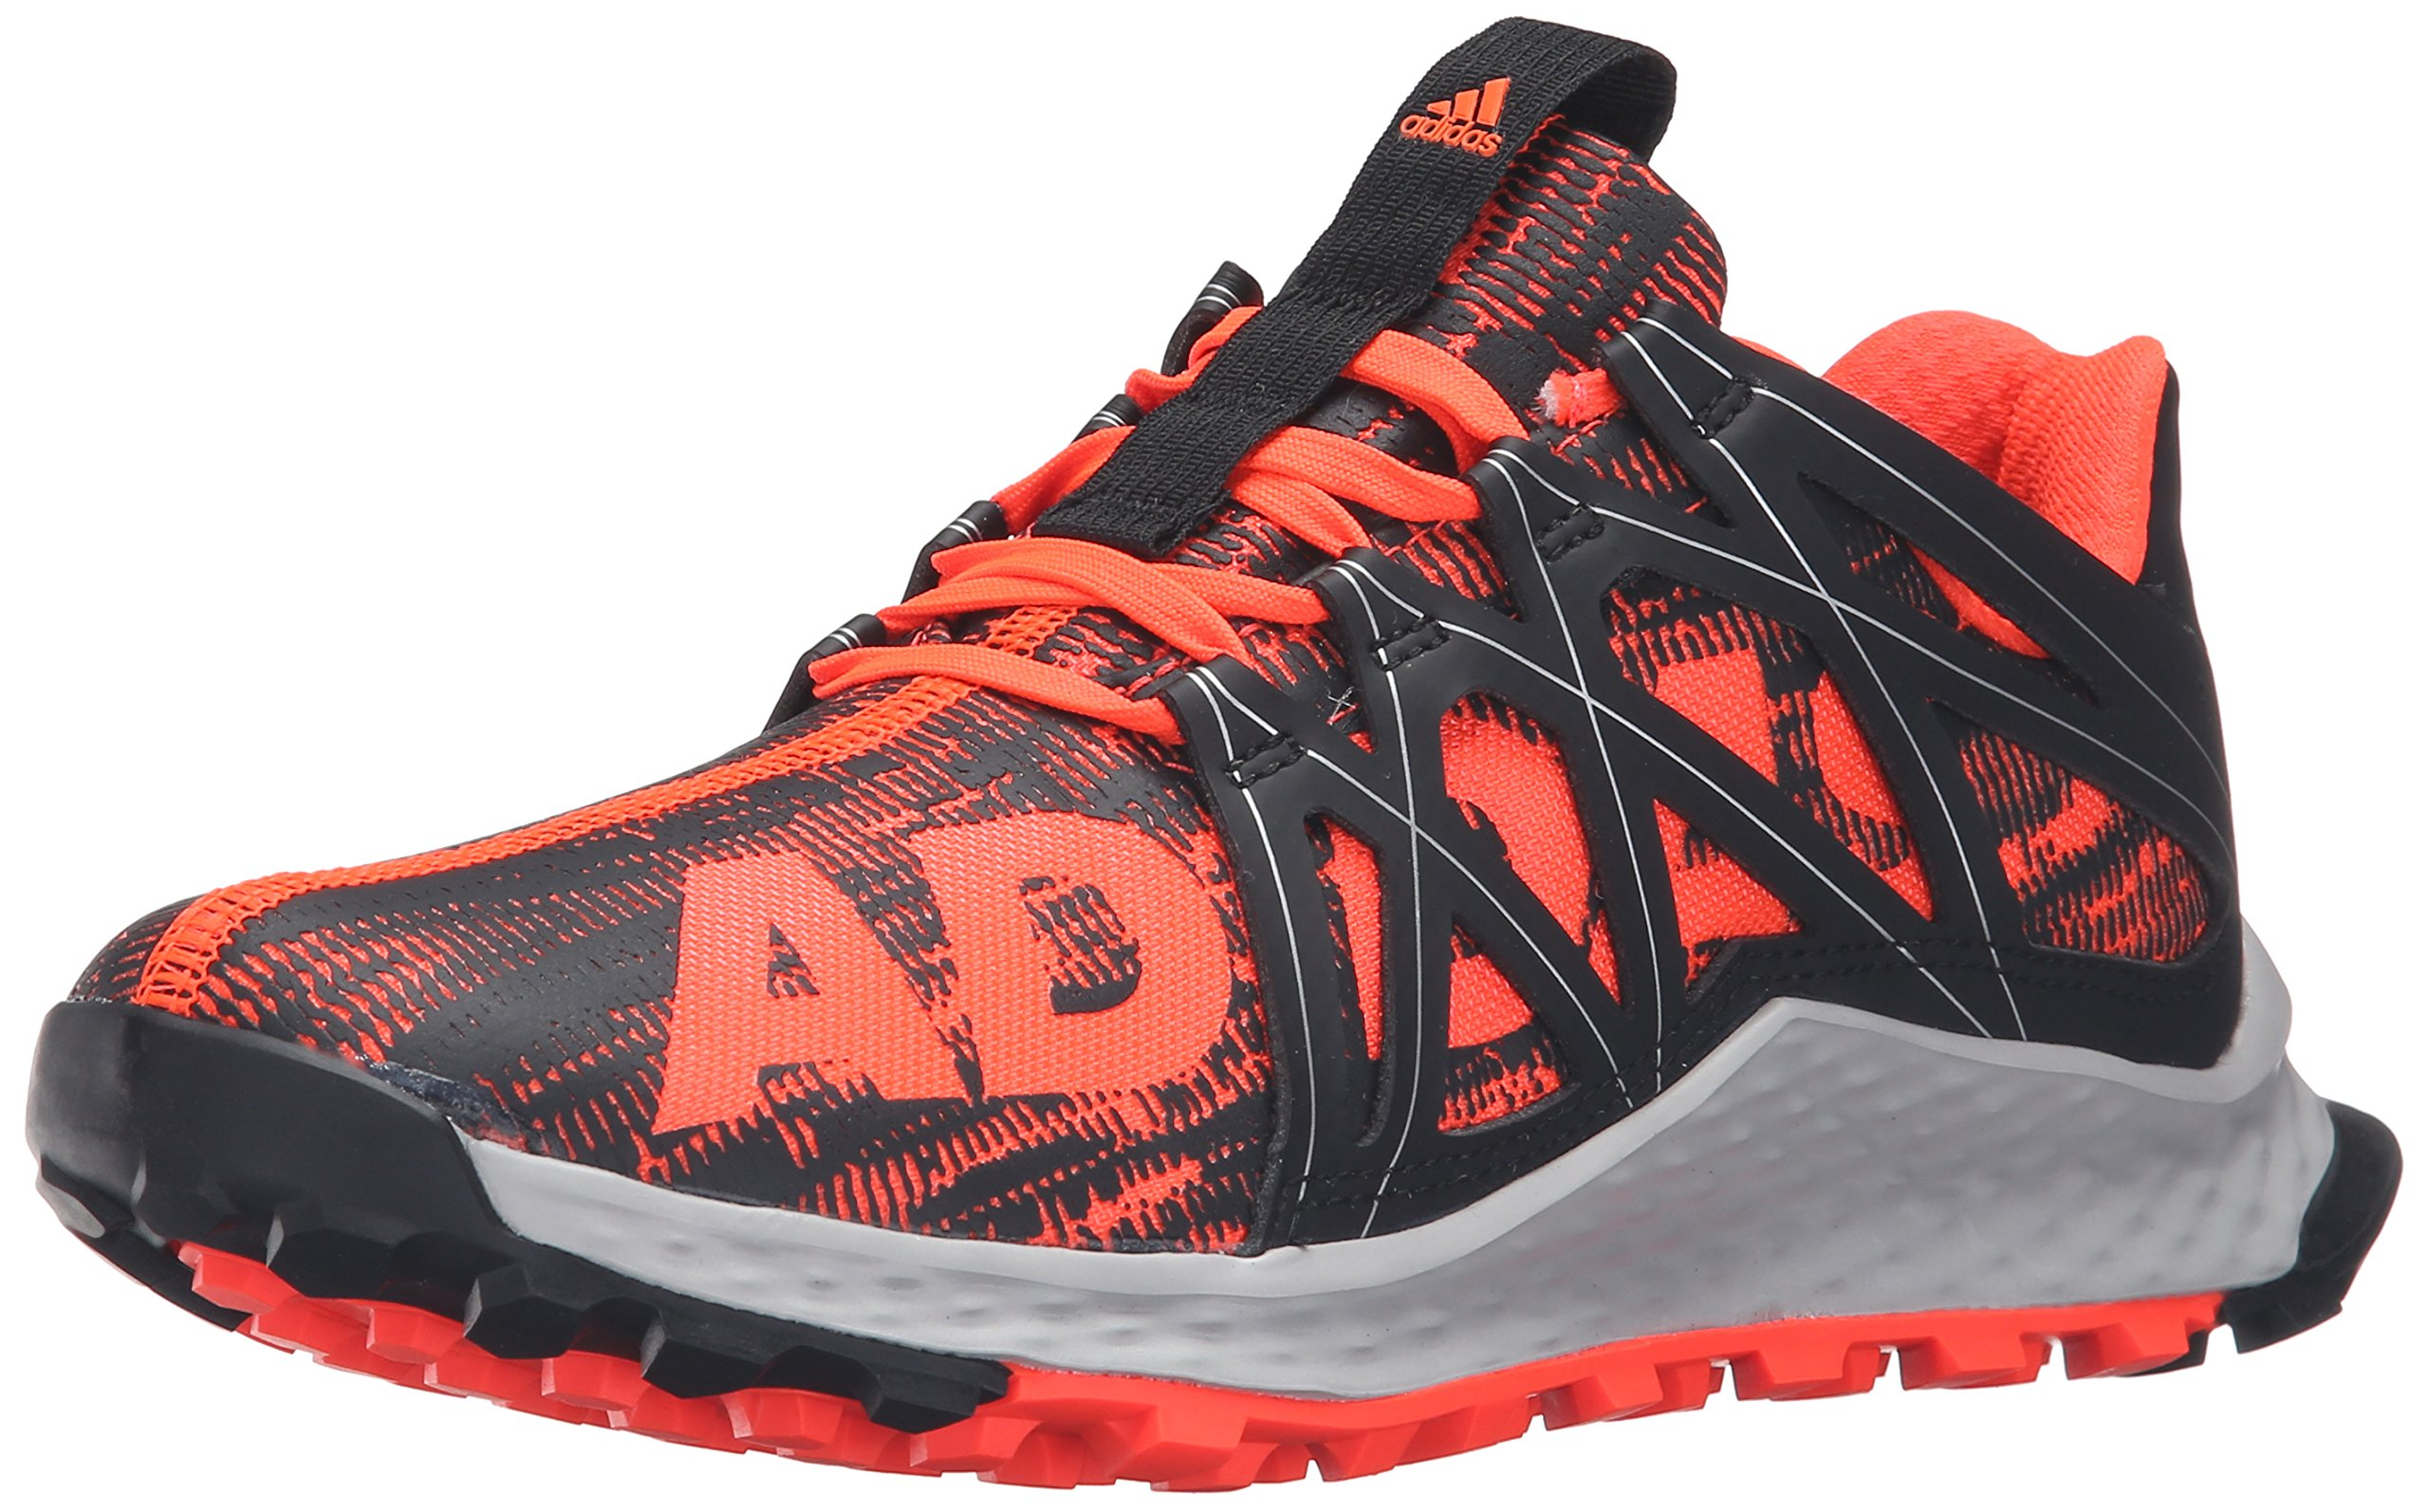 c8f83c96f Galleon - Adidas Performance Men's Vigor Bounce Trail Runner, Solar  Red/Light Scarlet/Black, 9 M US